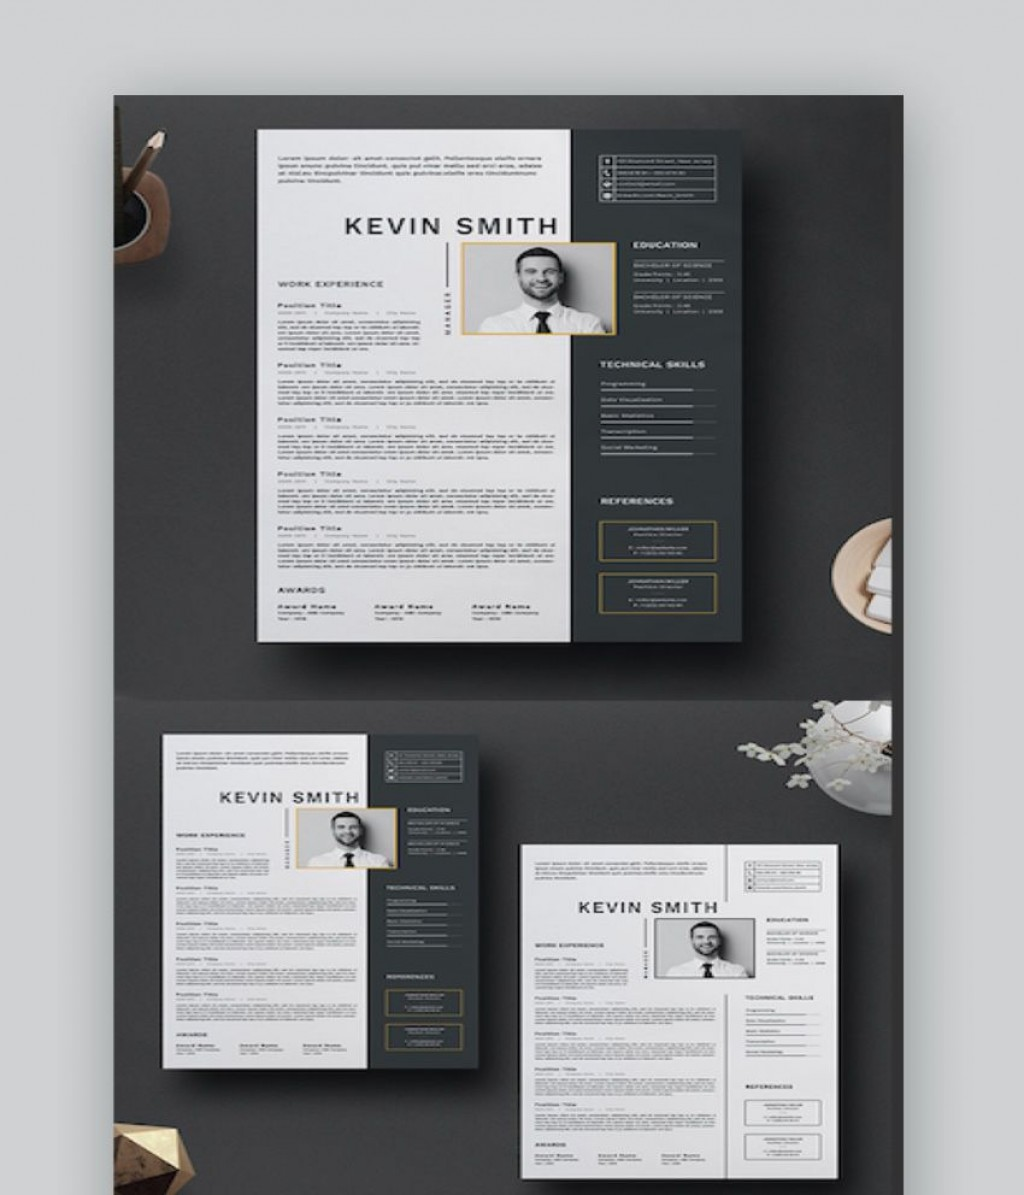 007 Dreaded Adobe Photoshop Resume Template Free Image  DownloadLarge